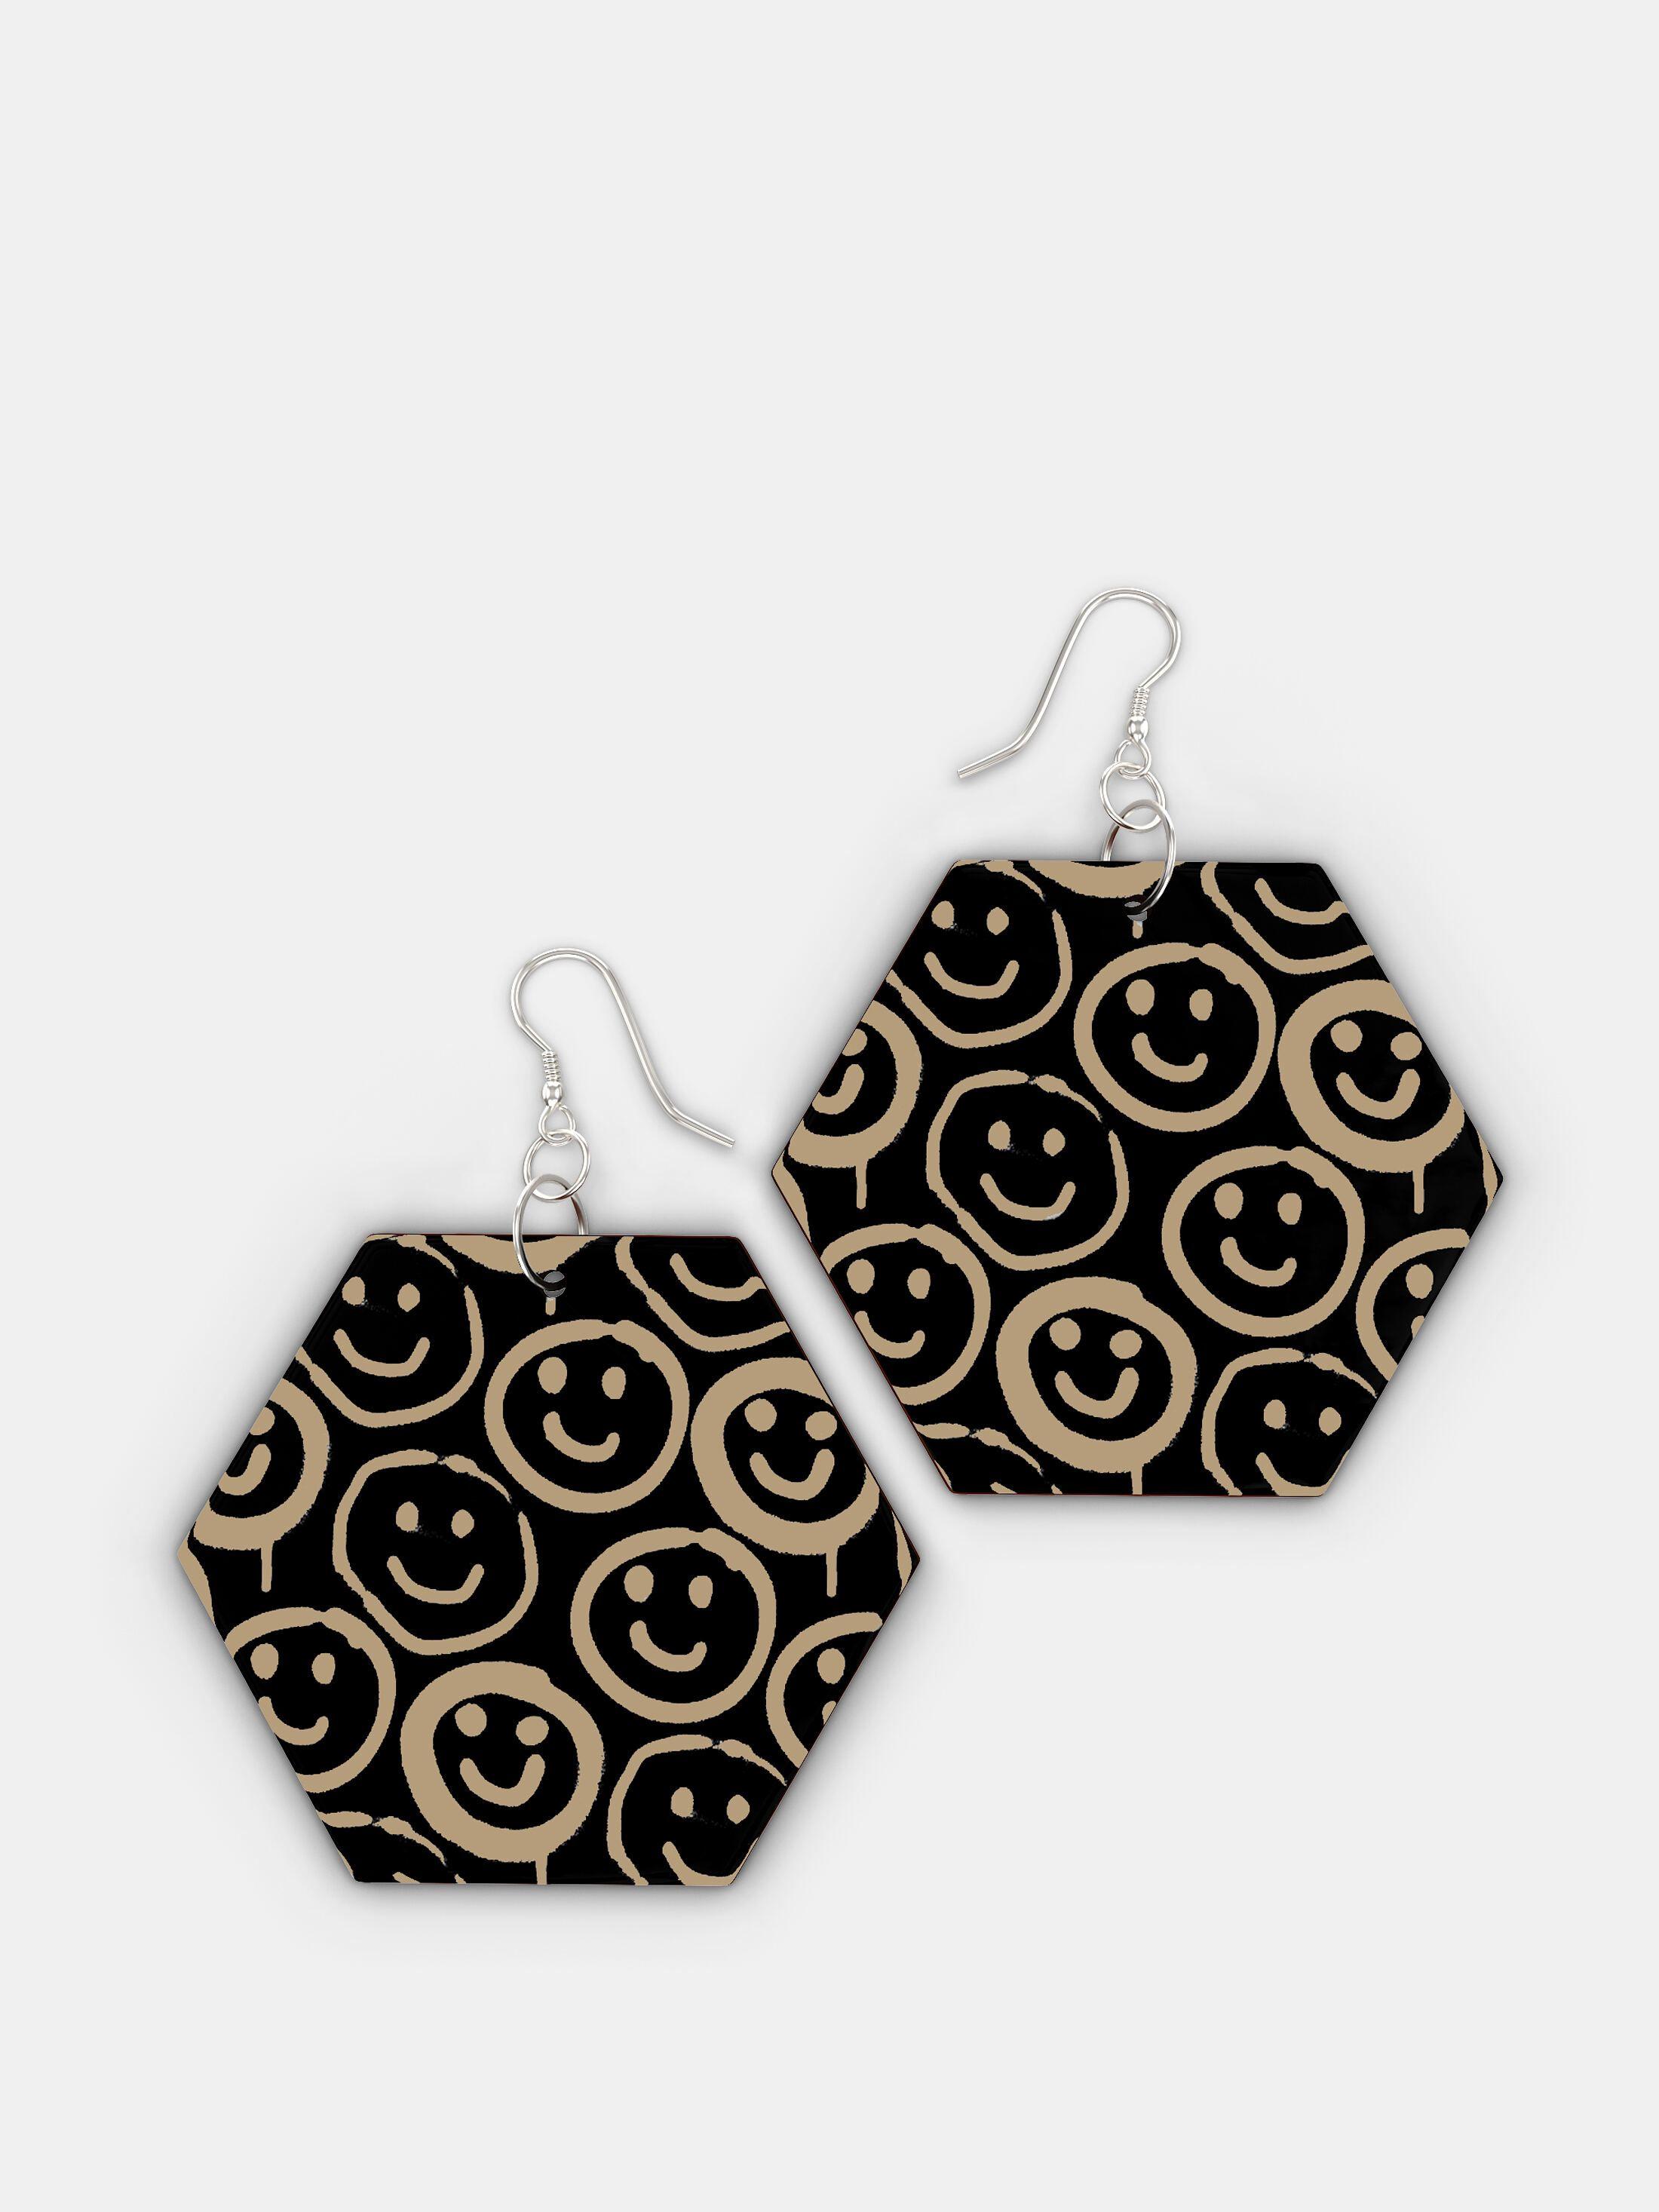 design your own wooden earrings hexagon